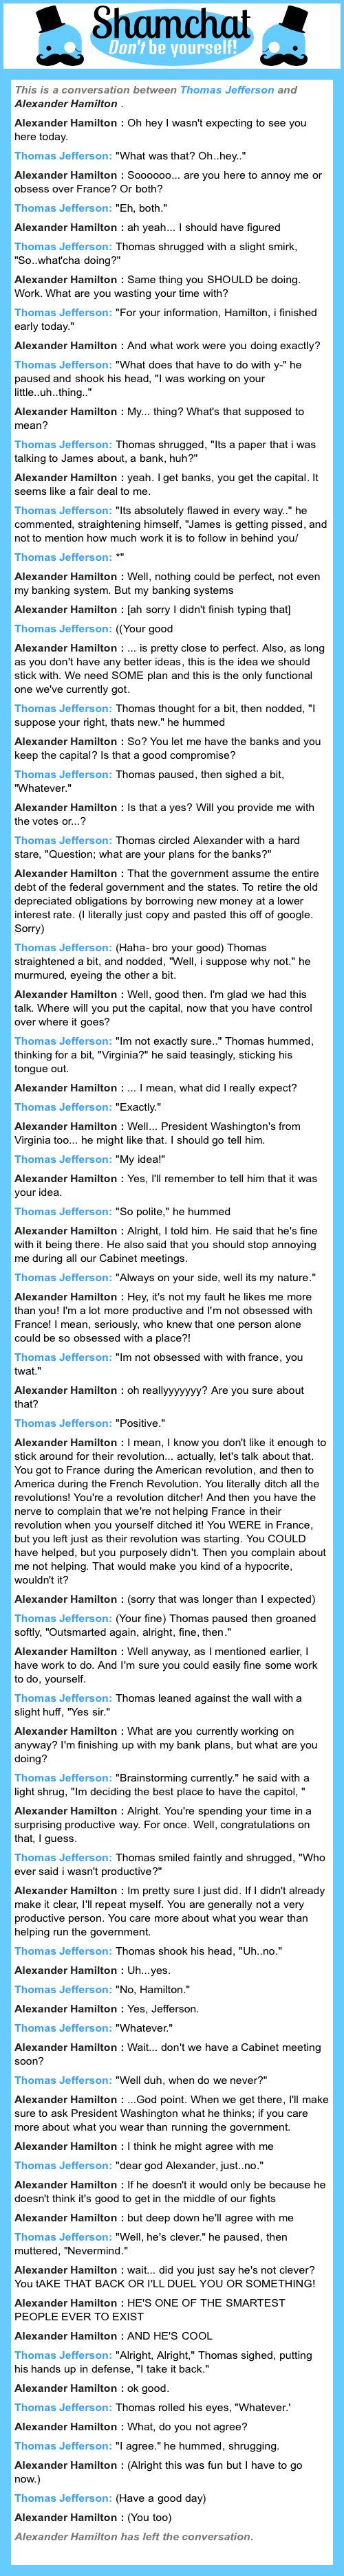 worksheet Thomas Jefferson Worksheet the 25 best thomas jefferson hamilton ideas on pinterest a conversation between alexander and jefferson